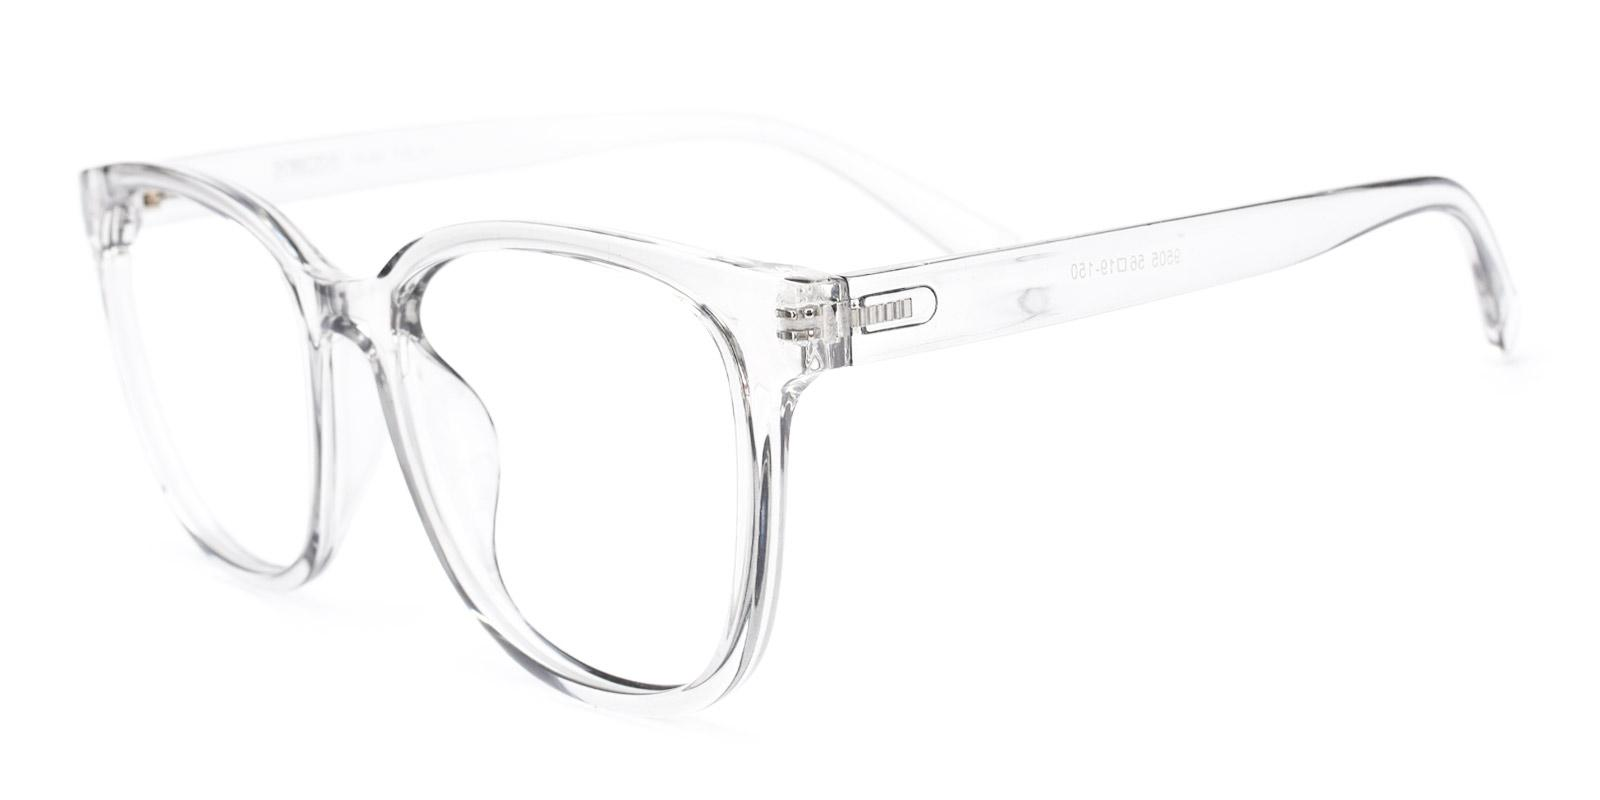 Edgar-Translucent-Square-TR-Eyeglasses-additional1